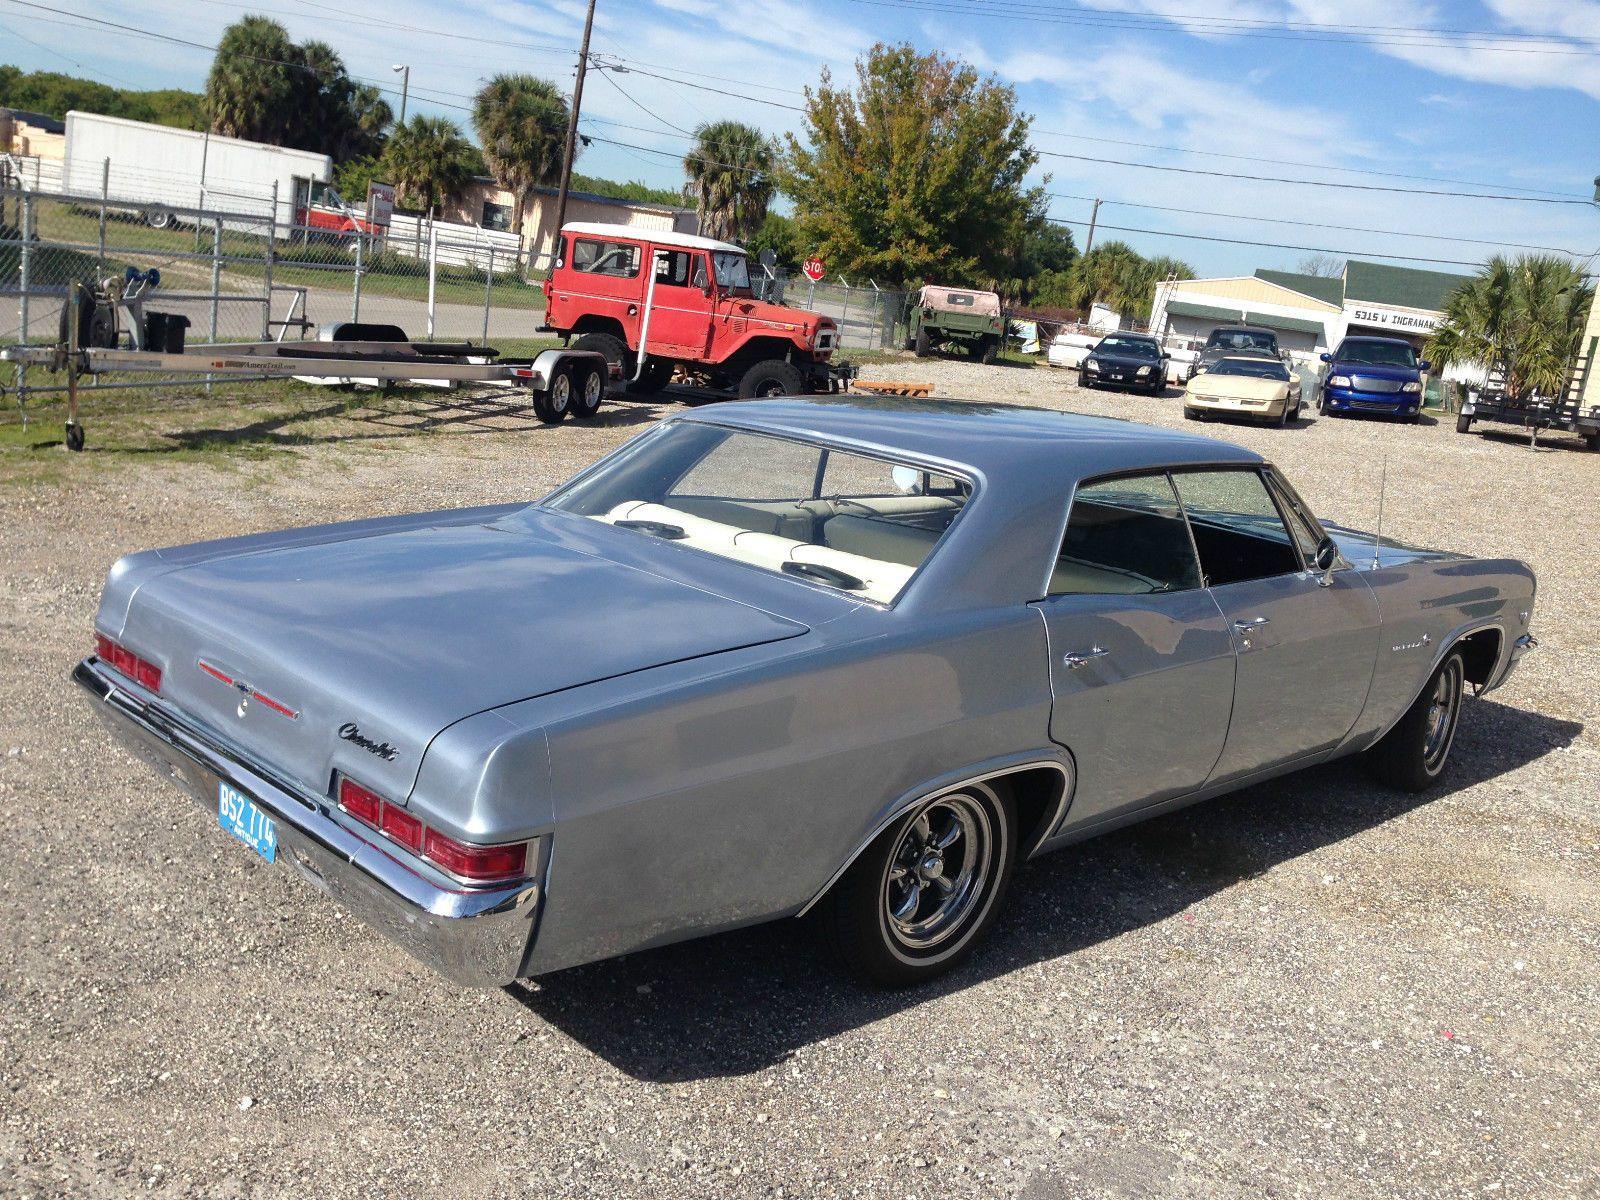 1966 Chevy Impala 4 Door Hardtop For Sale In Tampa Florida United States 1966 Chevy Impala Chevy Impala Chevy